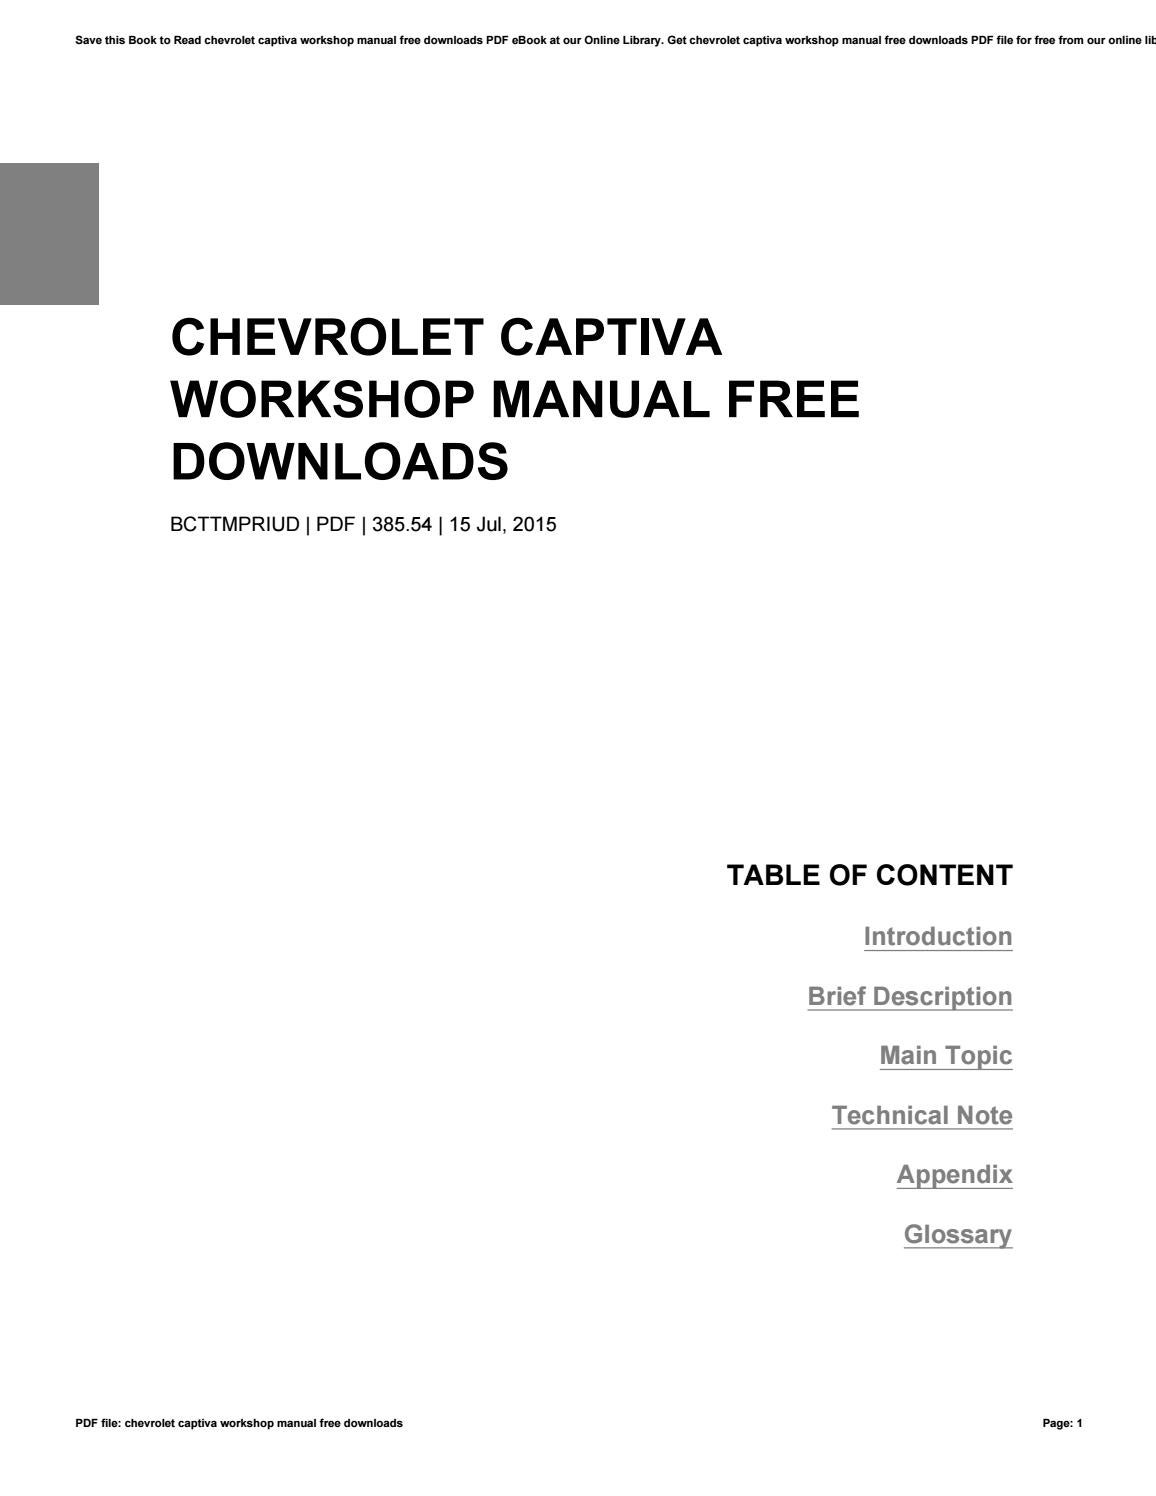 Chevrolet captiva workshop manual free downloads by